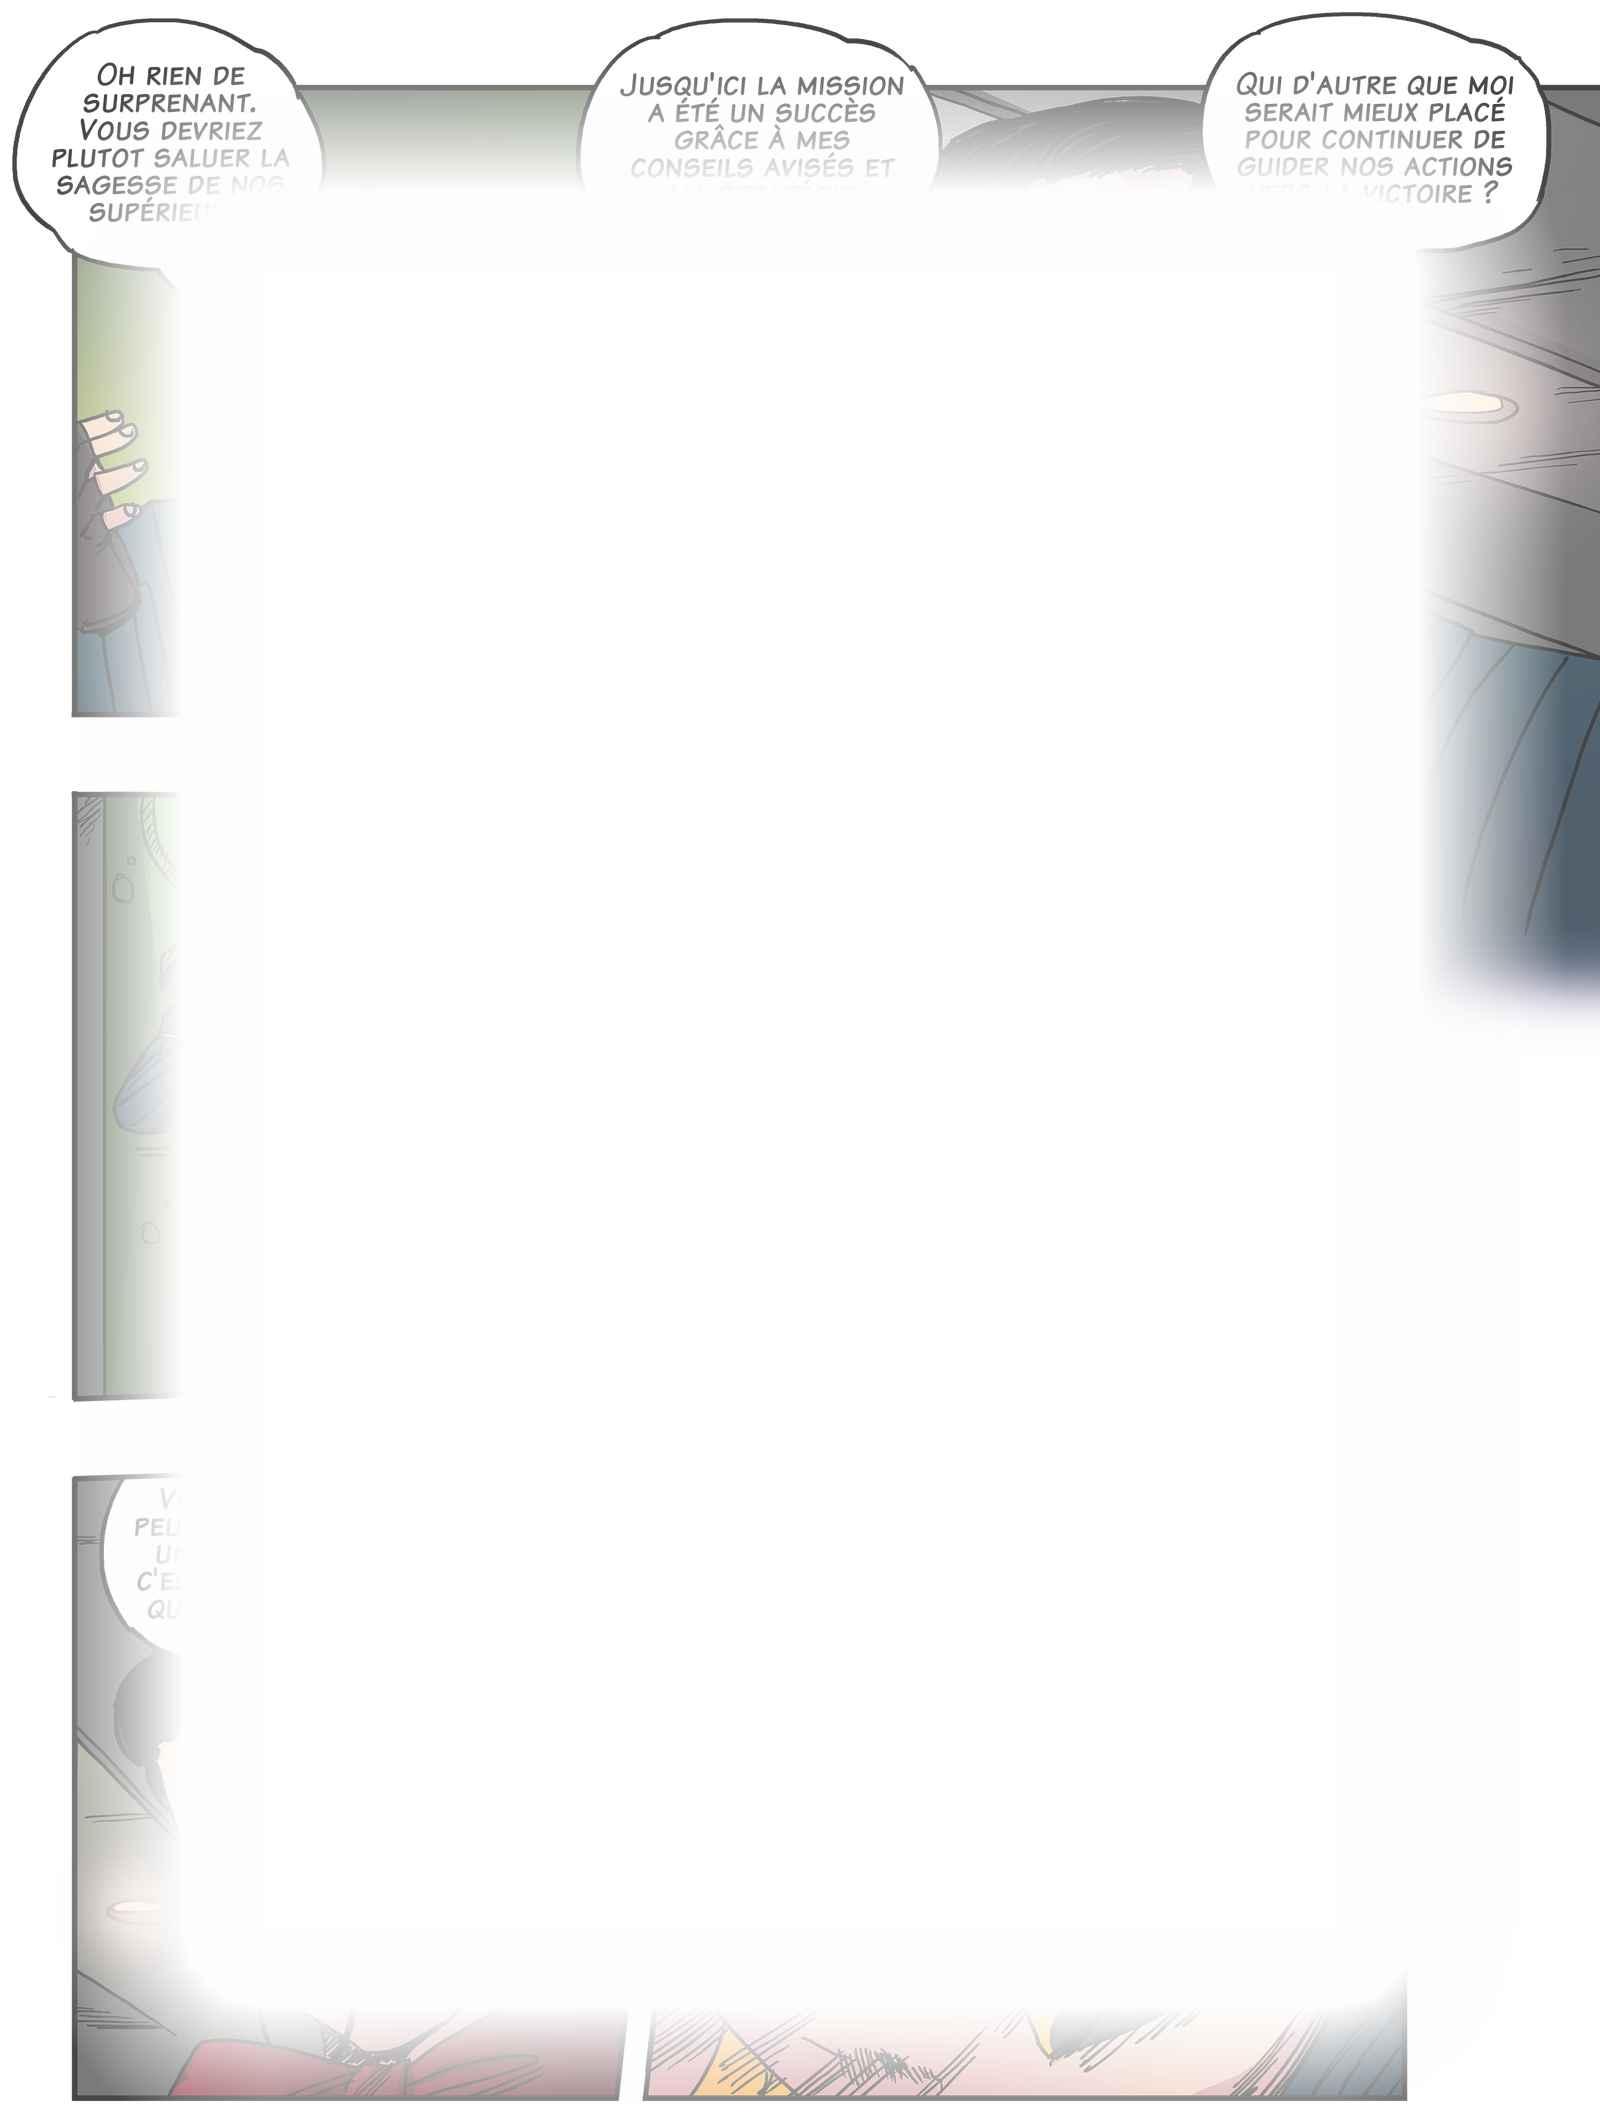 Amilova : Chapitre 8 page 20